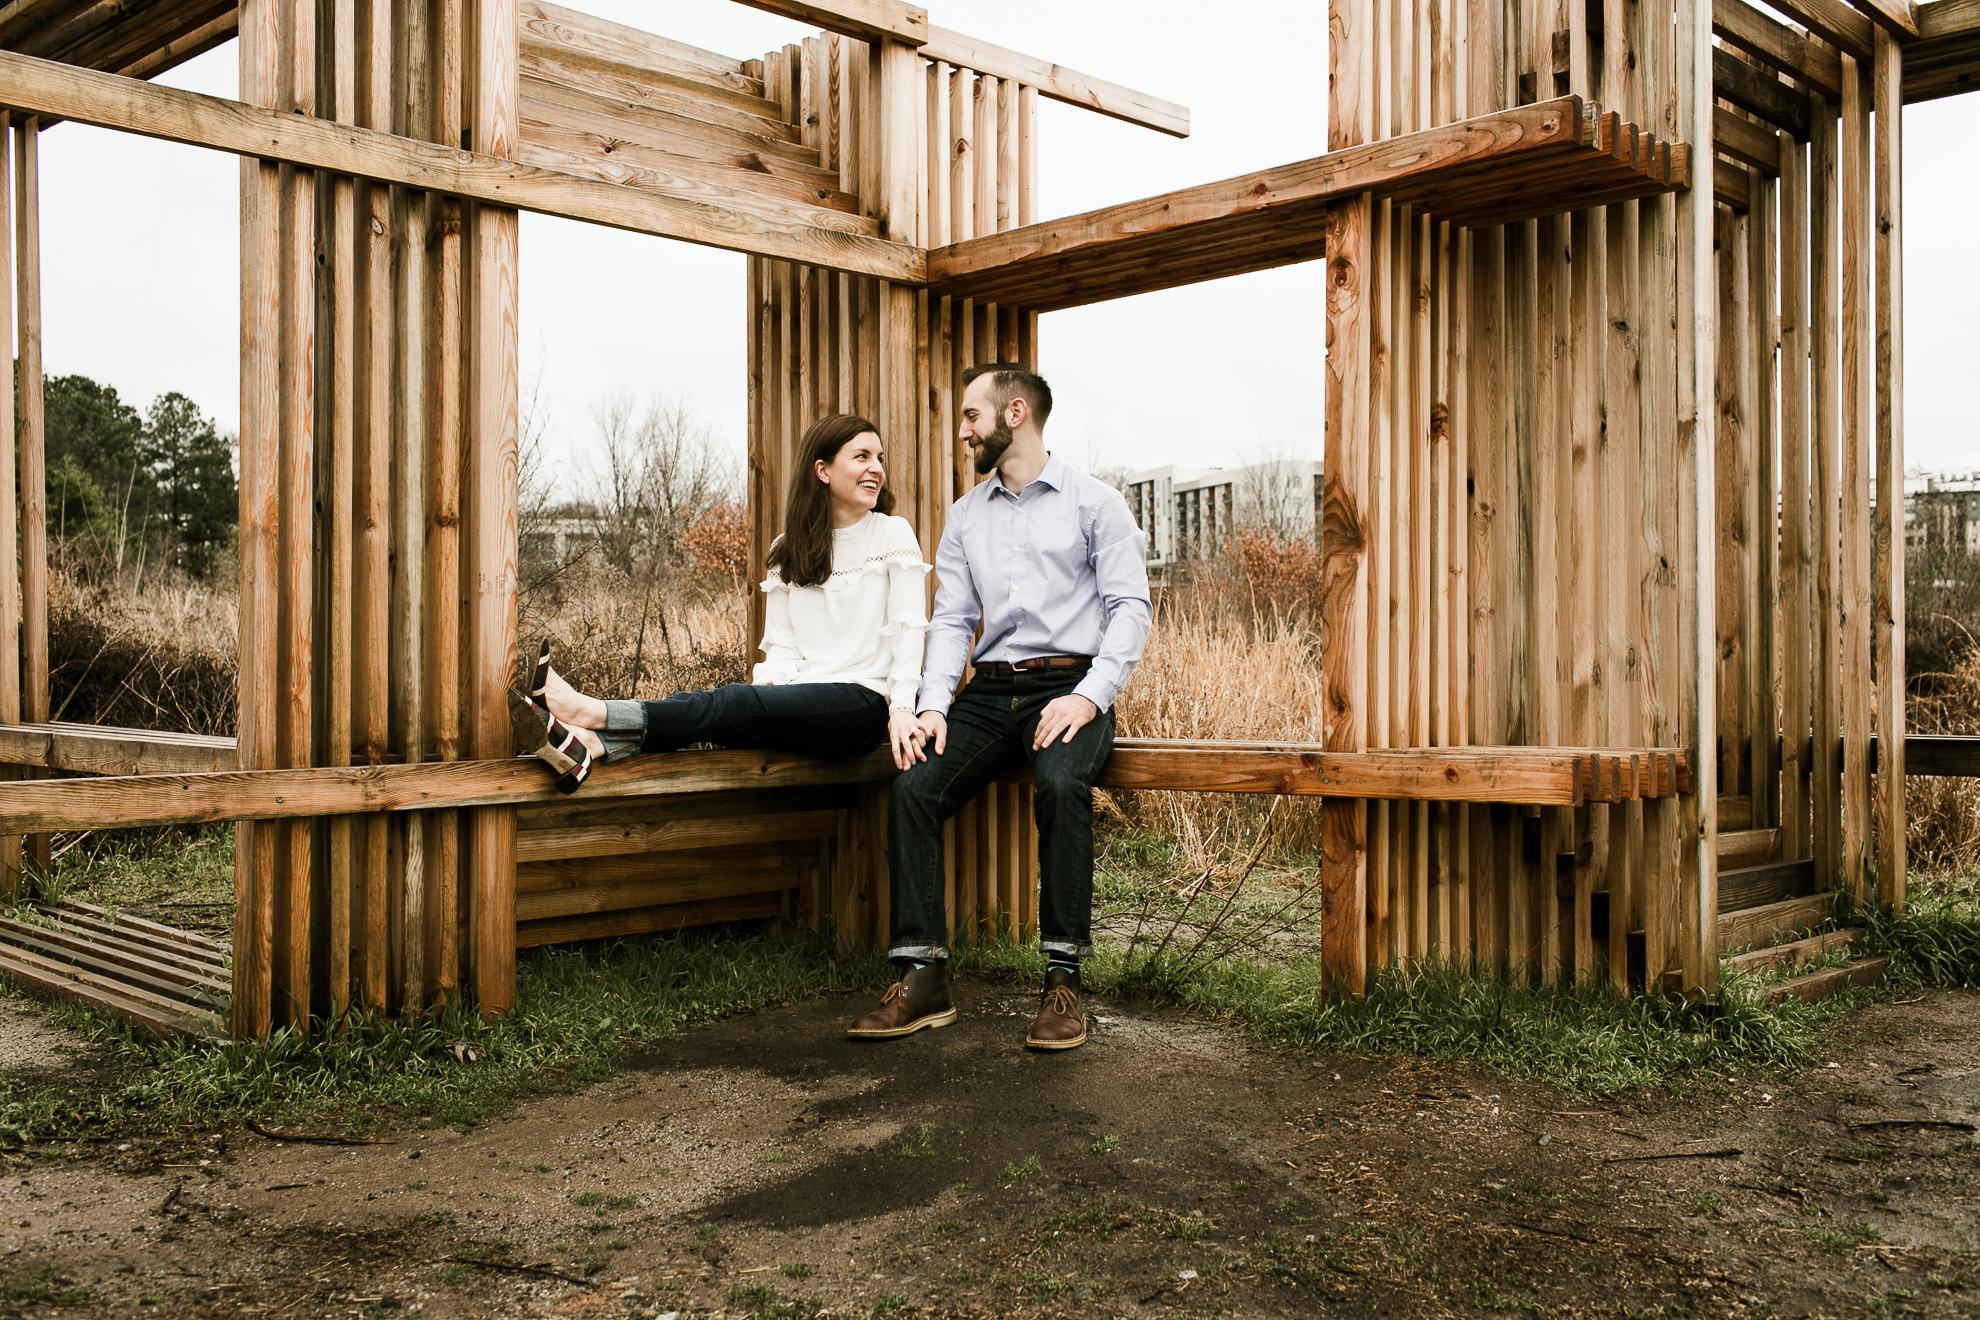 Gianna Keiko Atlanta Beltline Engagement Photographer-33.jpg